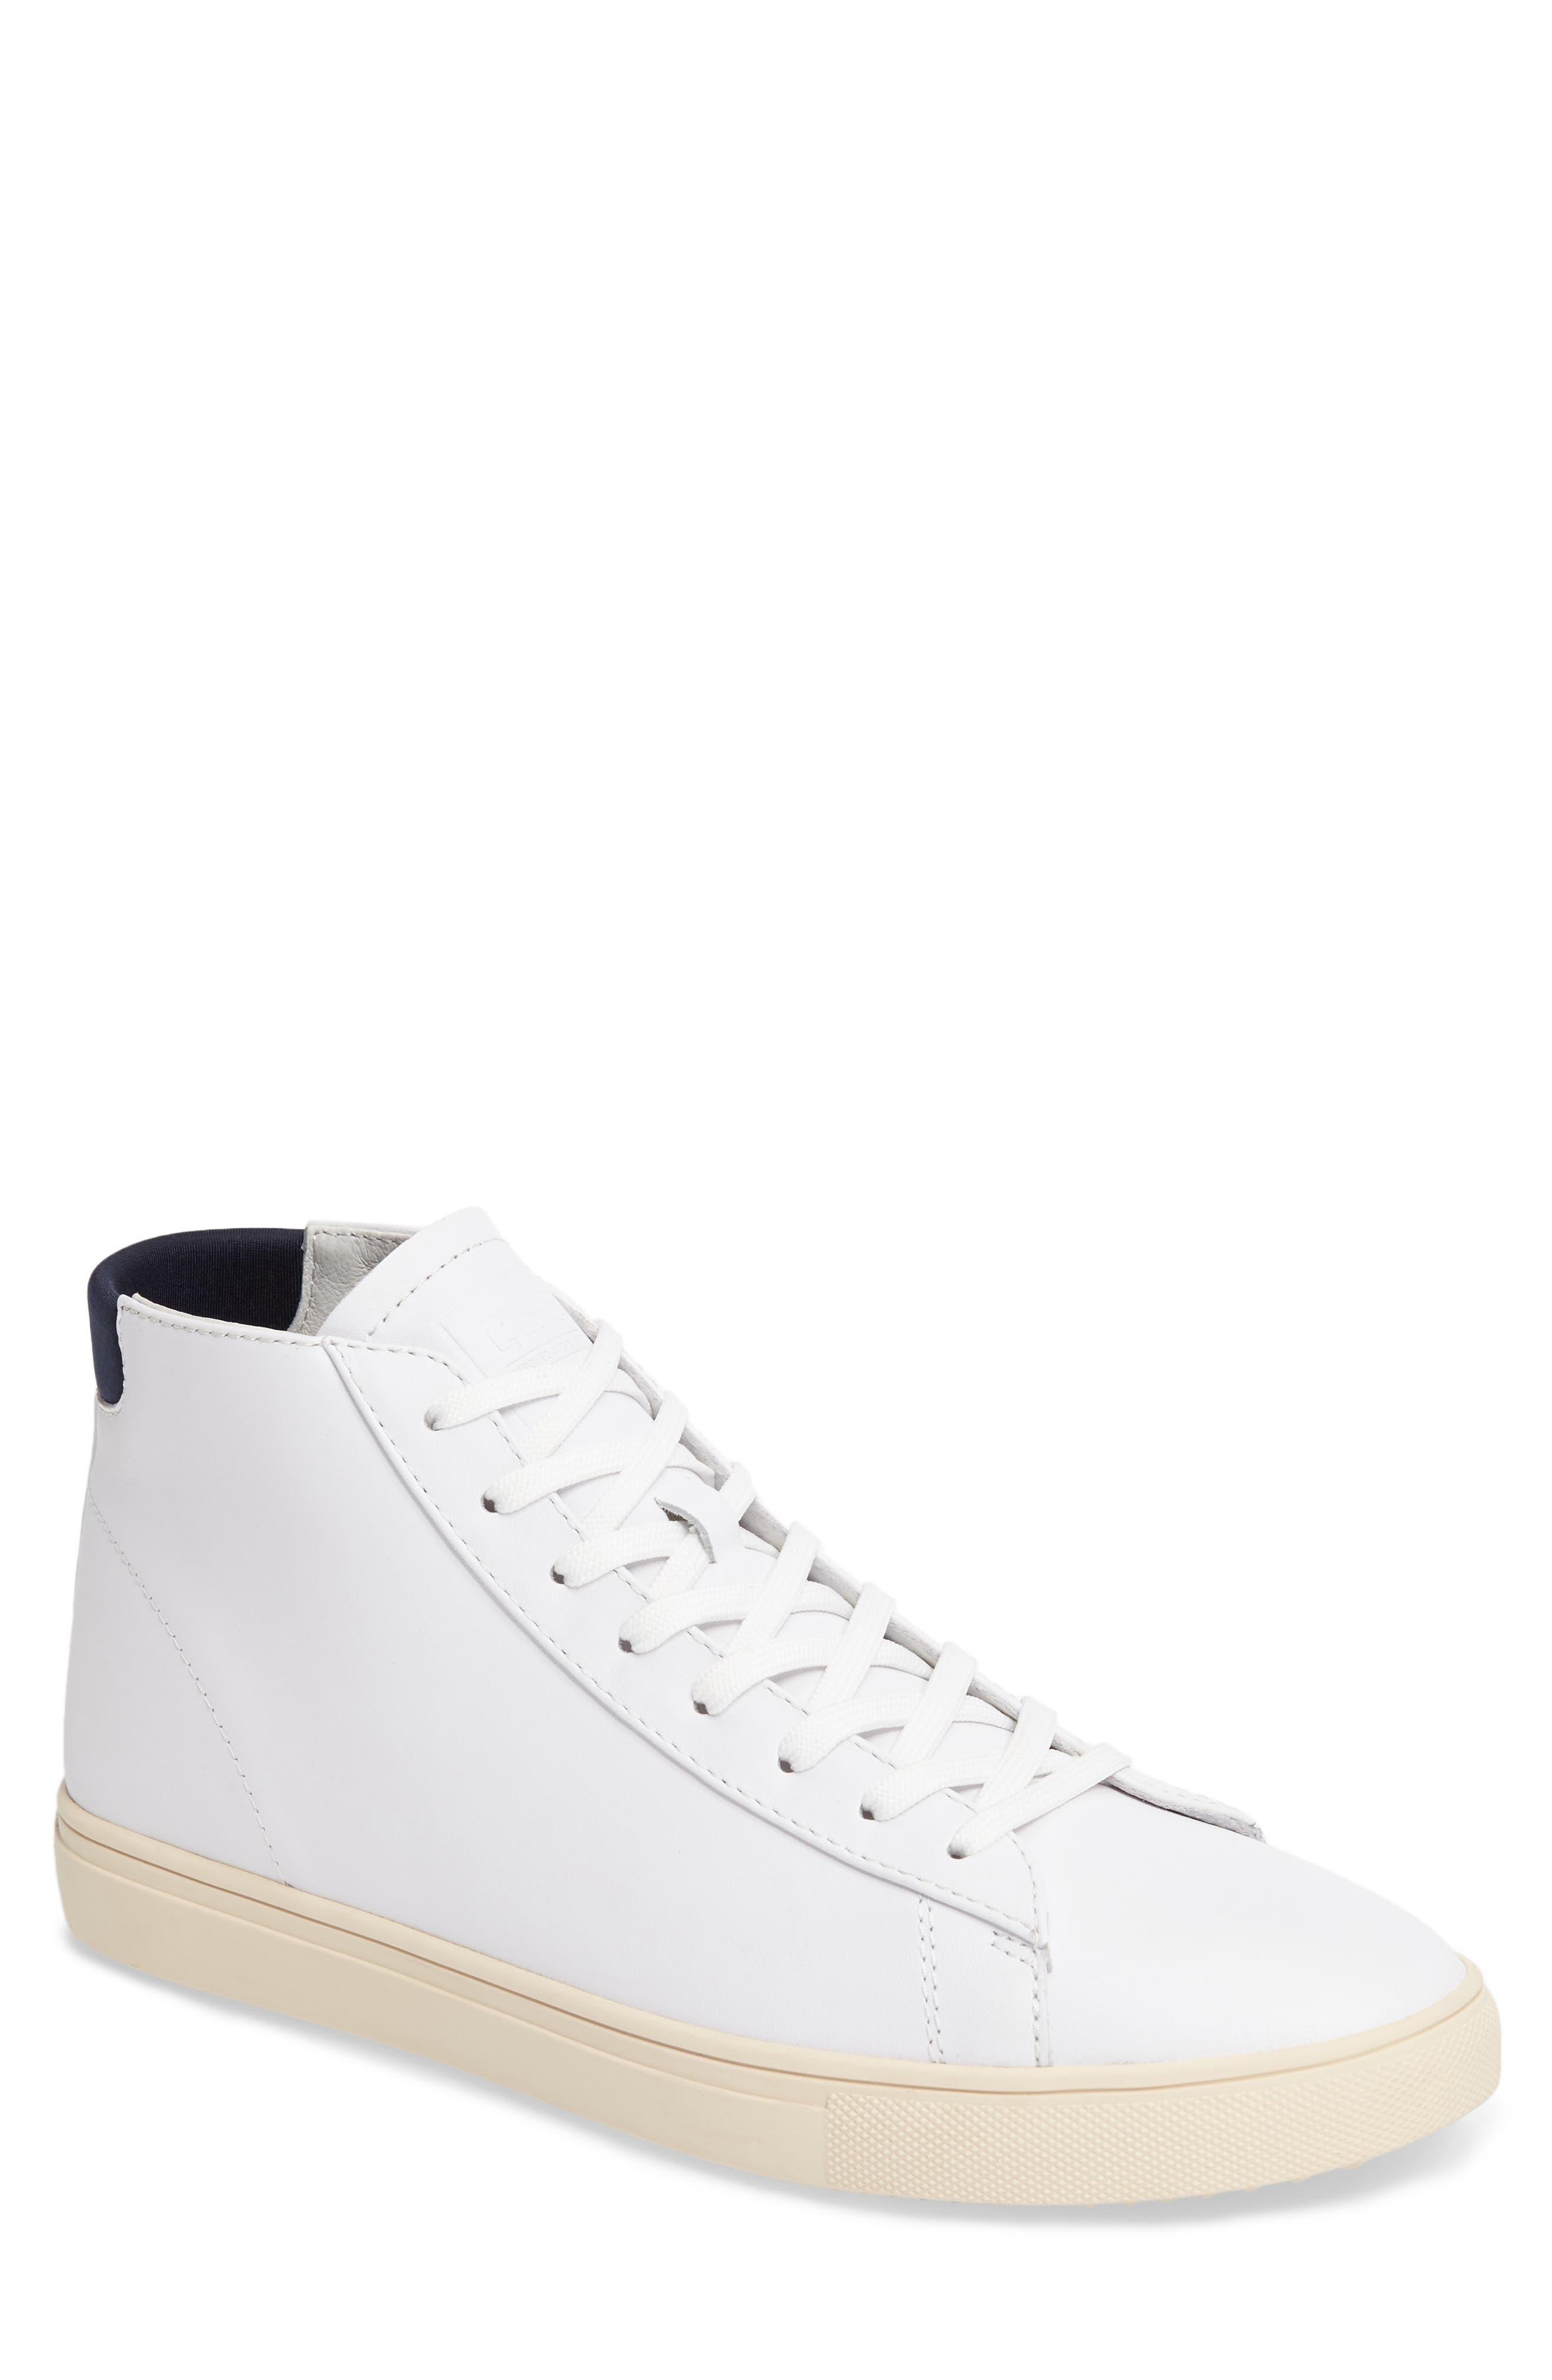 'Bradley Mid' Sneaker,                         Main,                         color, WHITE/WHITE LEATHER